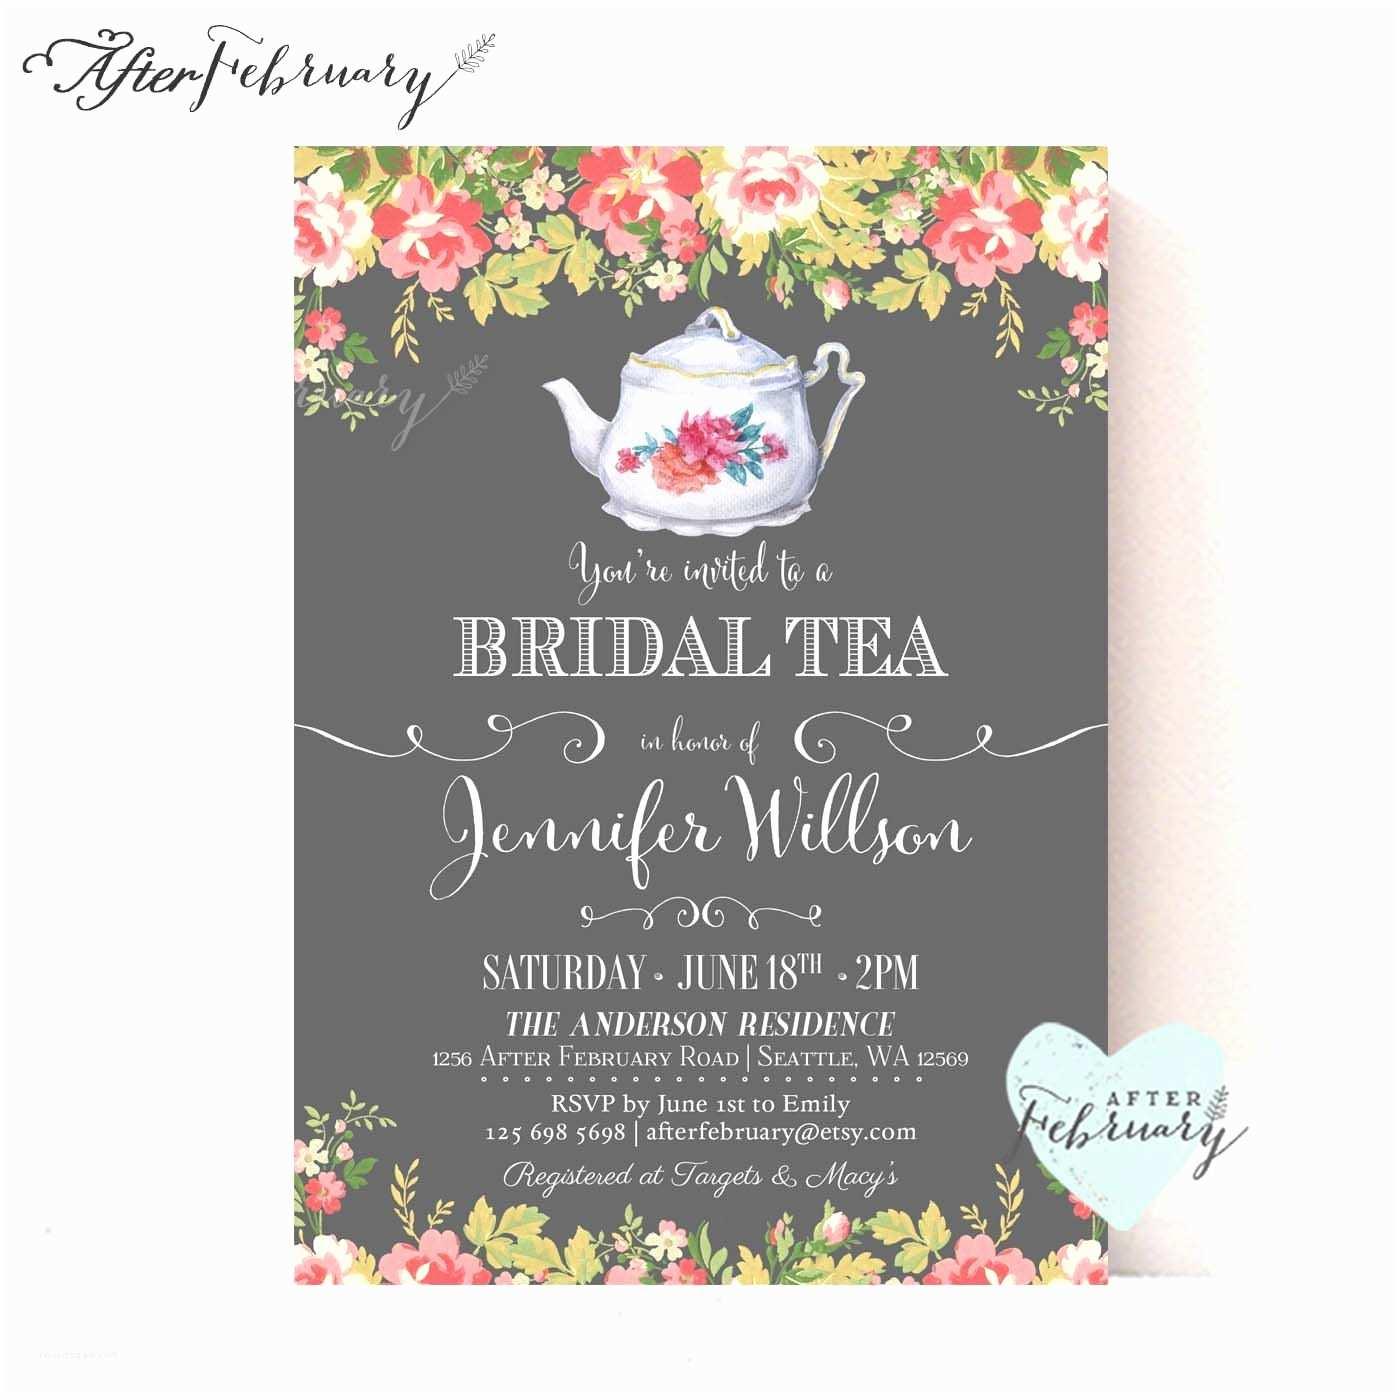 Tea Party Birthday Invitations Bridal Shower Invitations Bridal Shower Tea Party